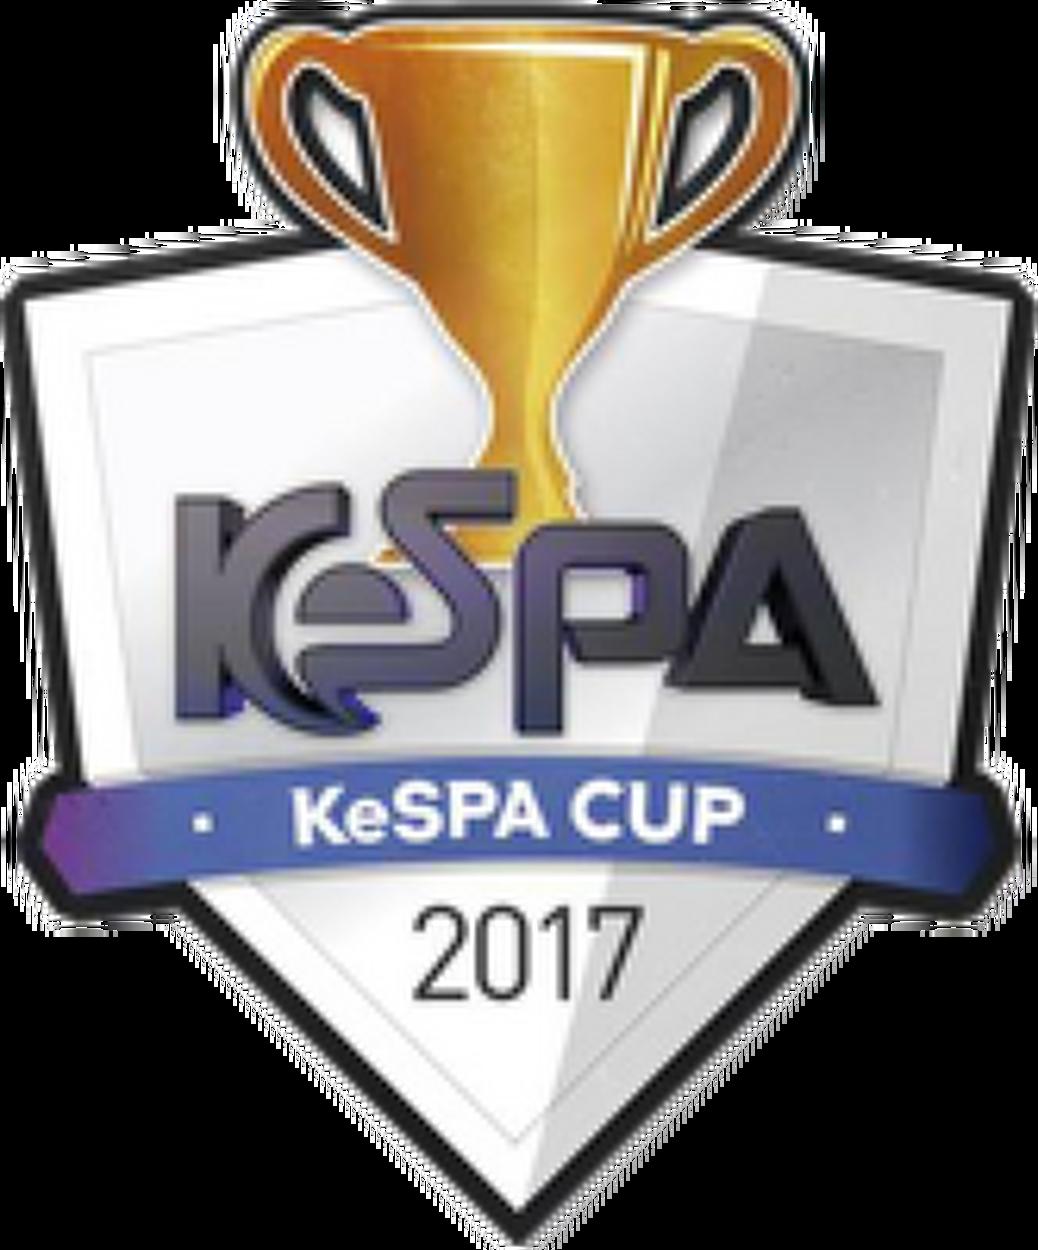 [KeSPA Cup - 케스파 컵] 2017 KeSPA Cup -..